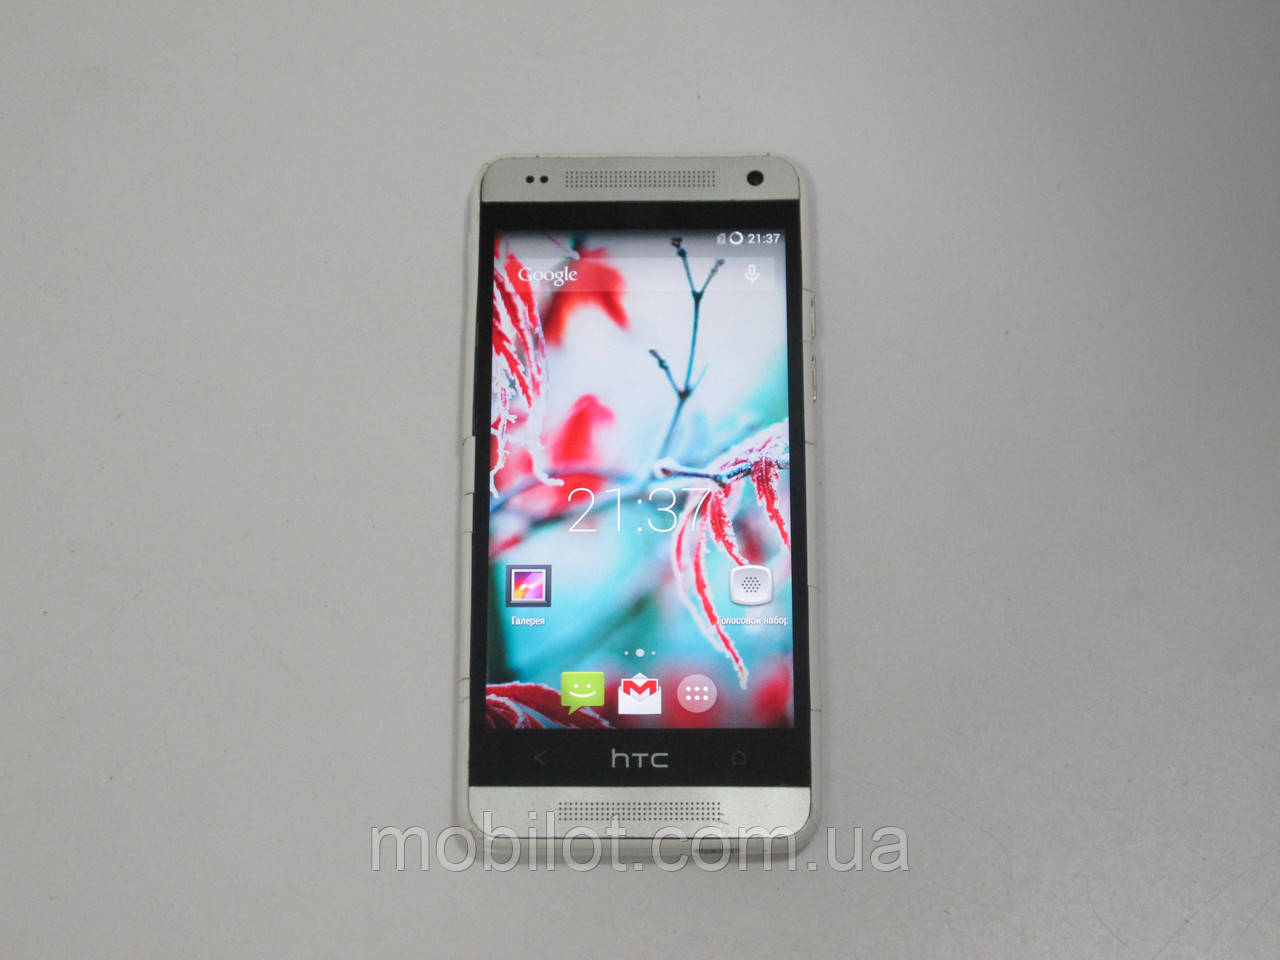 9294d9ff85c27 Мобильный телефон HTC ONE MINI 601n Silver (TZ-1106) - интернет-магазин